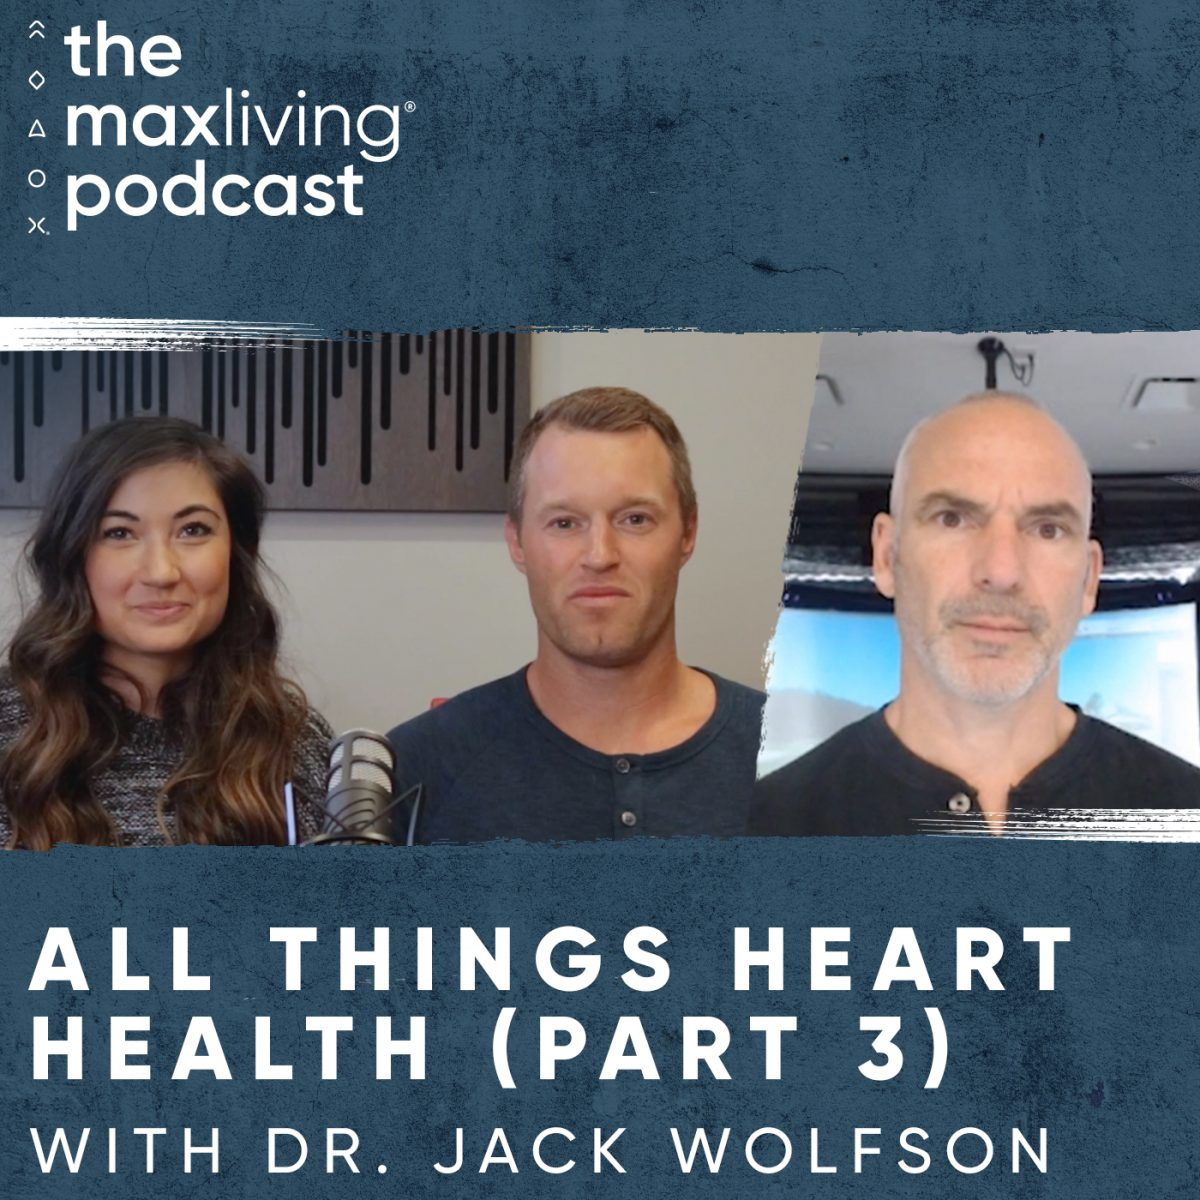 All Things Heart Health